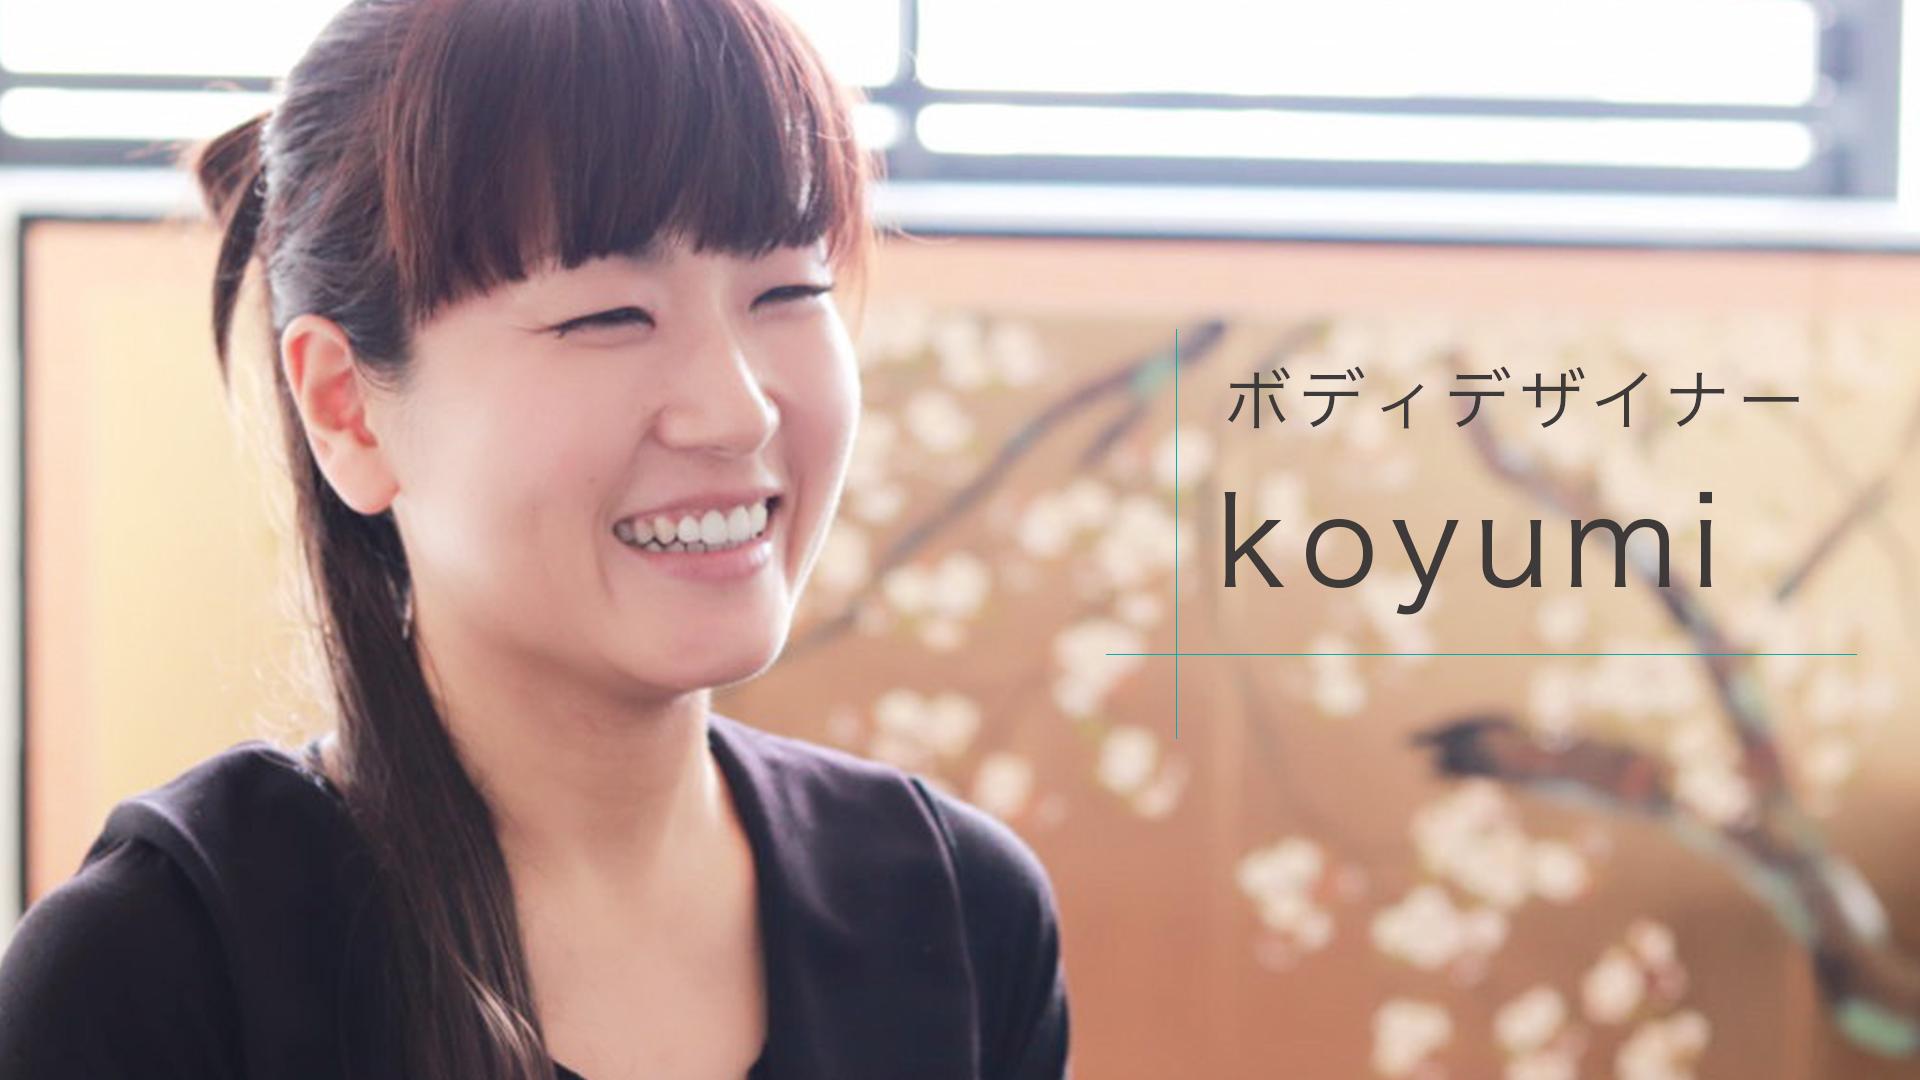 koyumi_interview_top